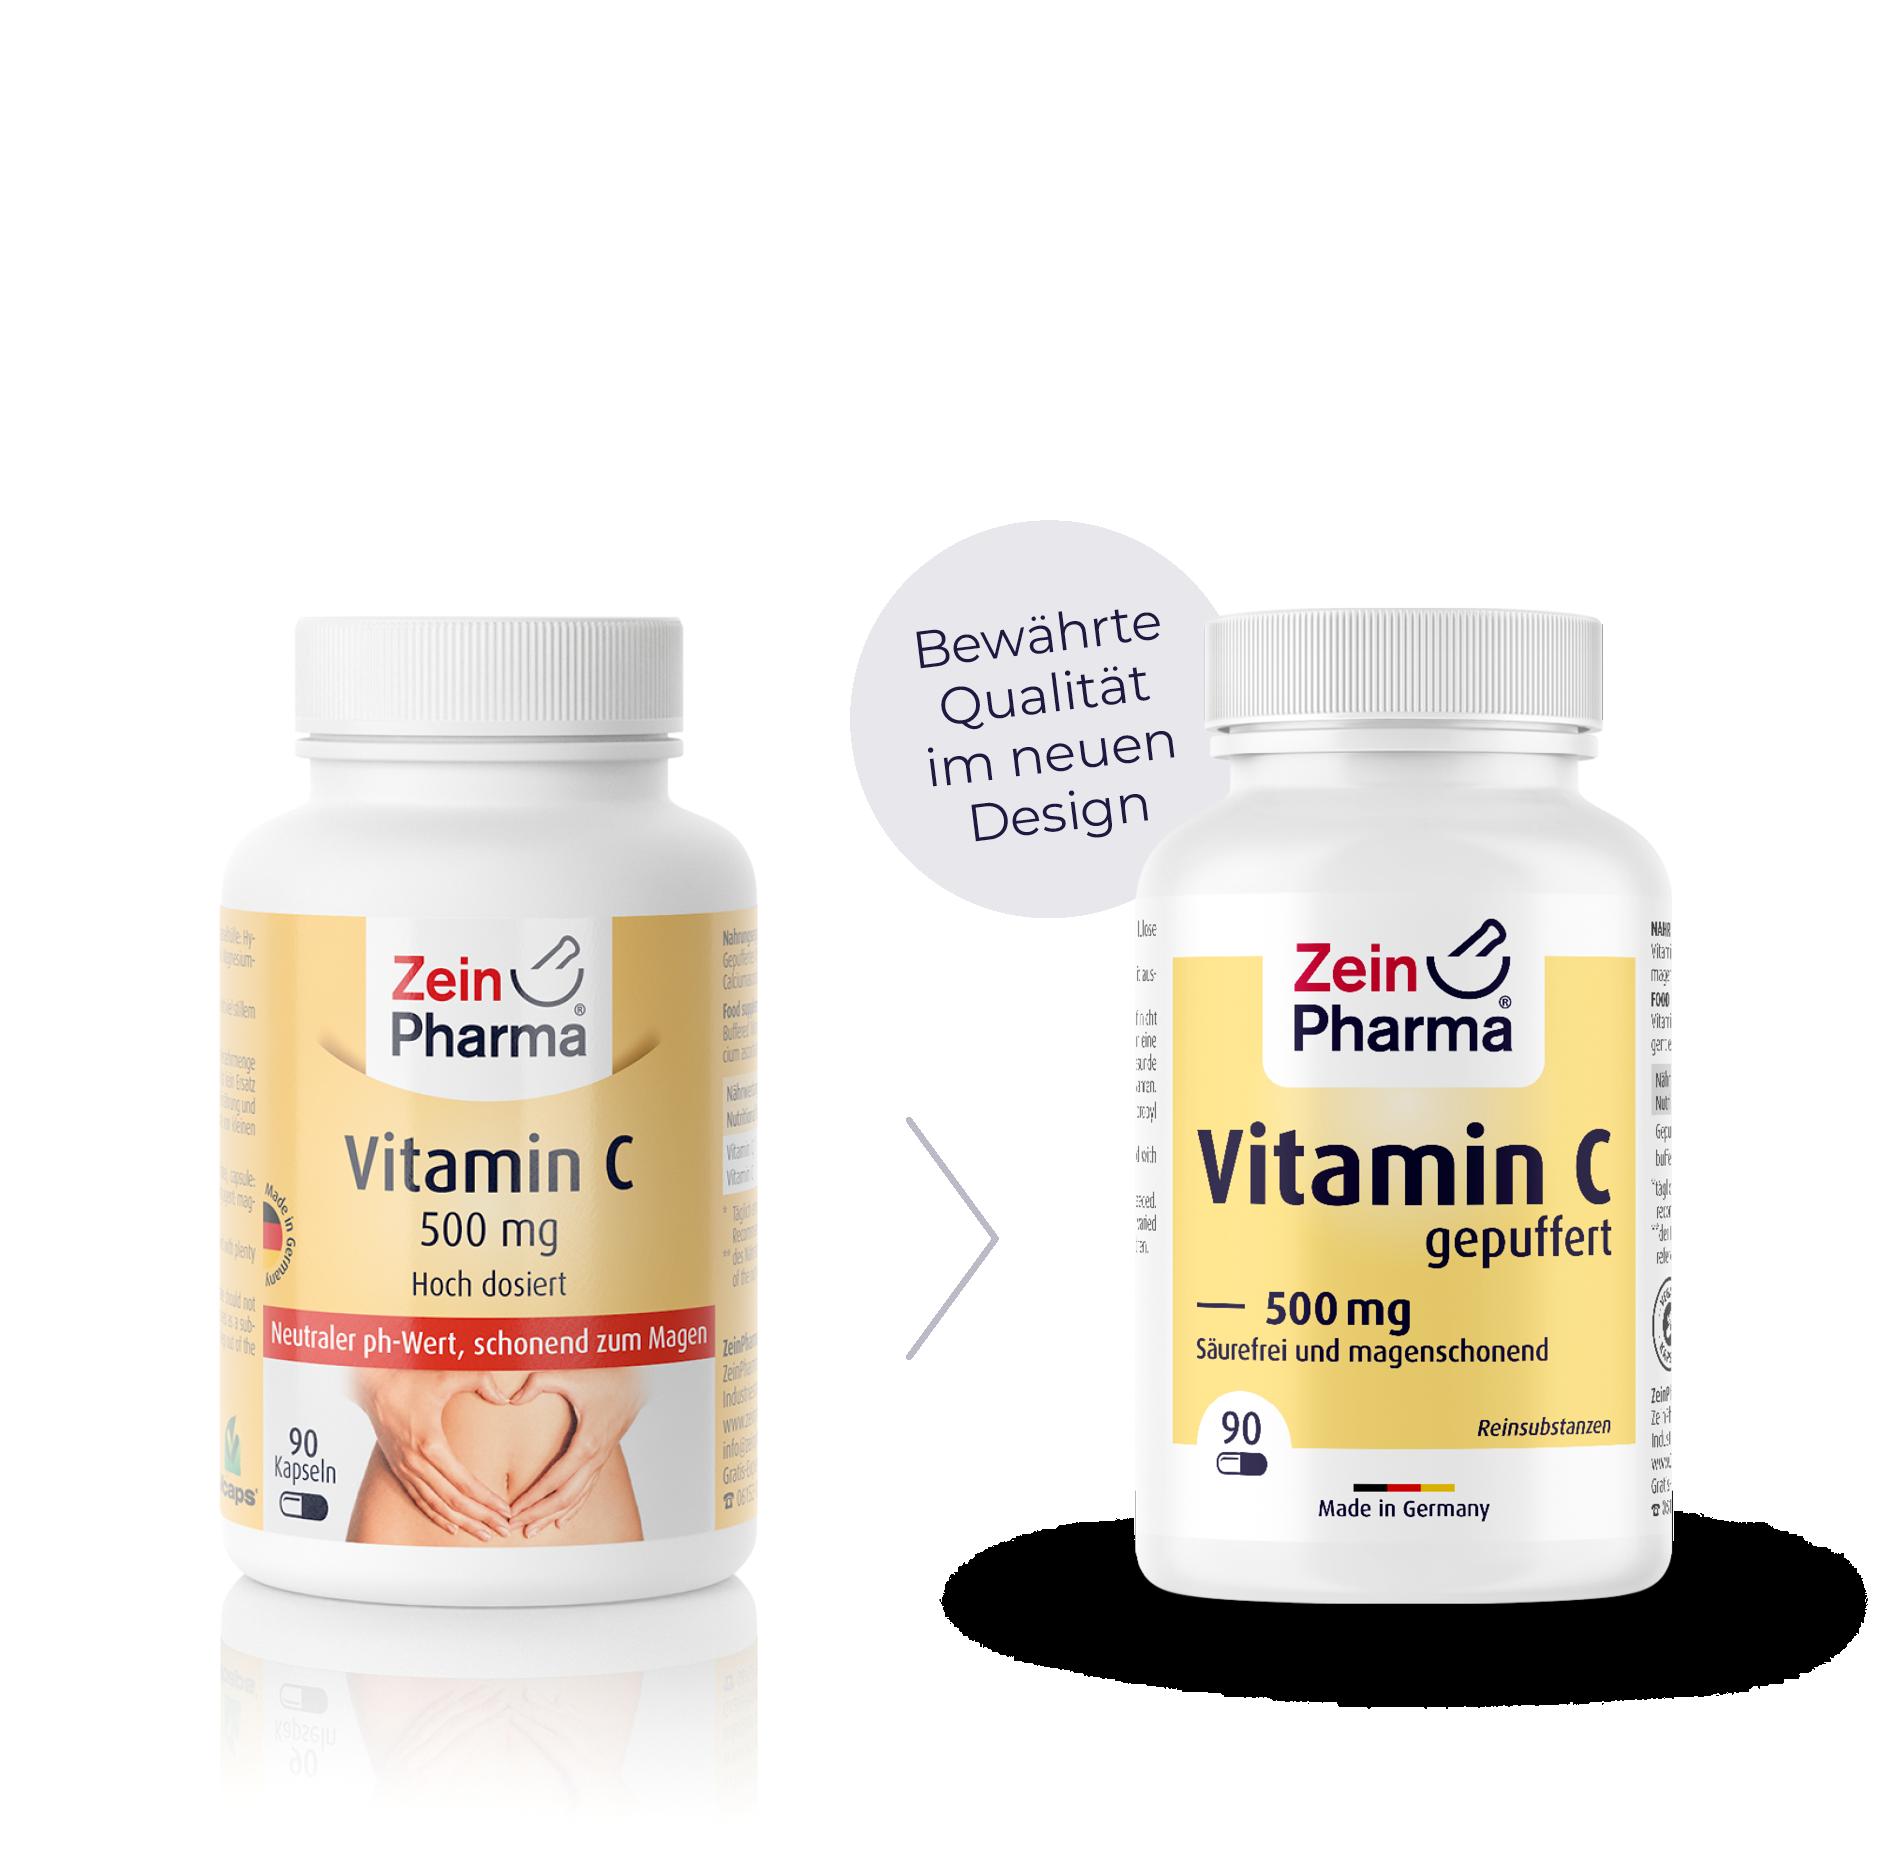 Vitamin C gepuffert 500 mg Kapseln